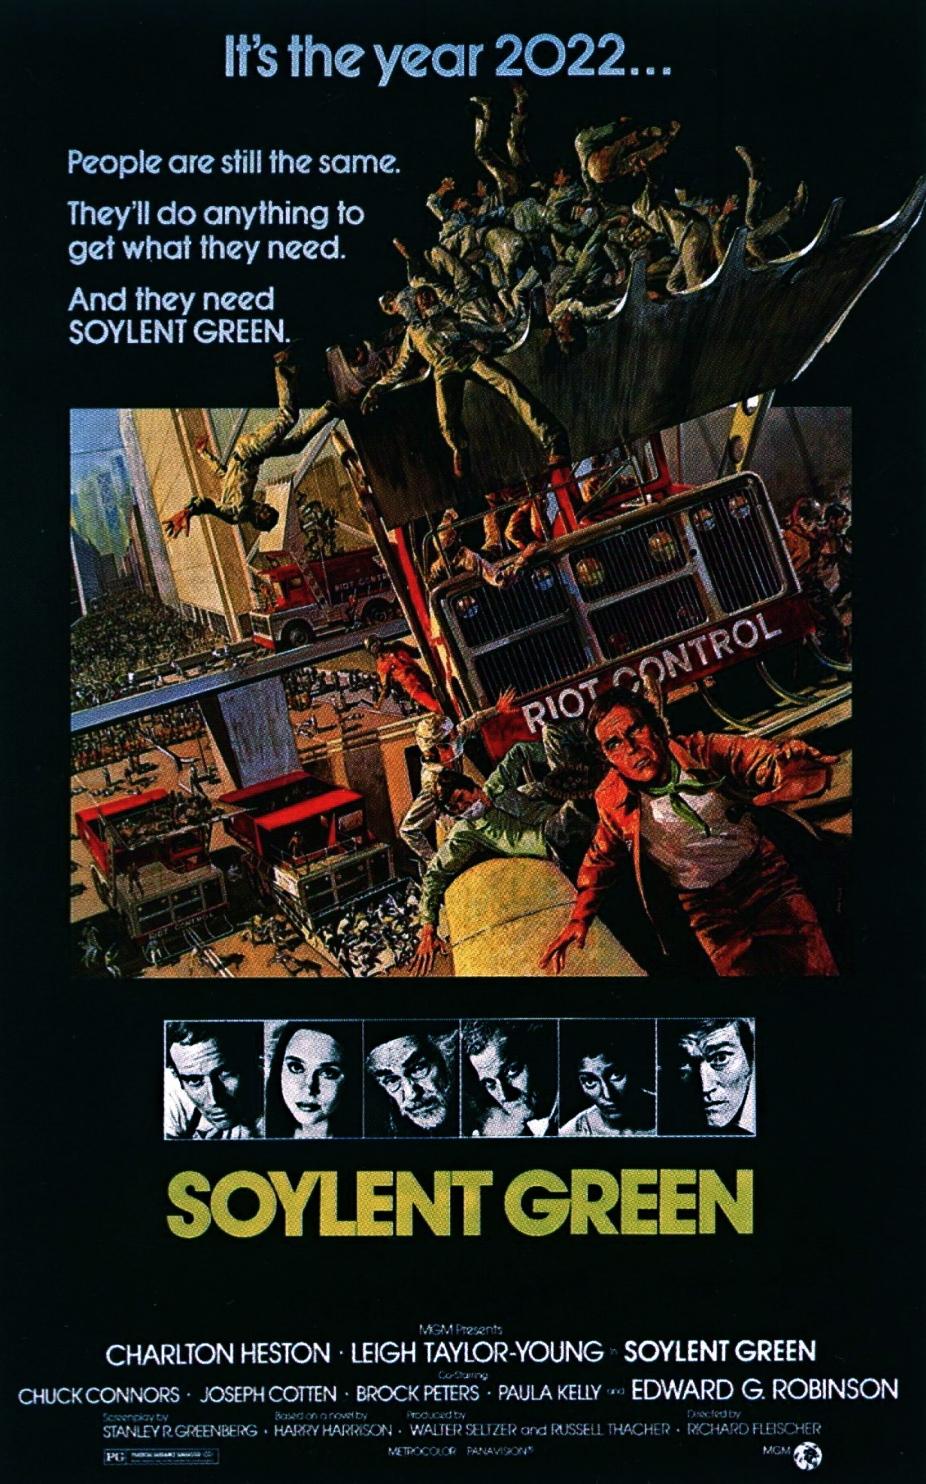 http://1.bp.blogspot.com/-zQ2LqPzdD7Q/UILI6ROvm1I/AAAAAAAAD3g/HDBJ4f8nfvs/s1600/Soylent+Green.jpg